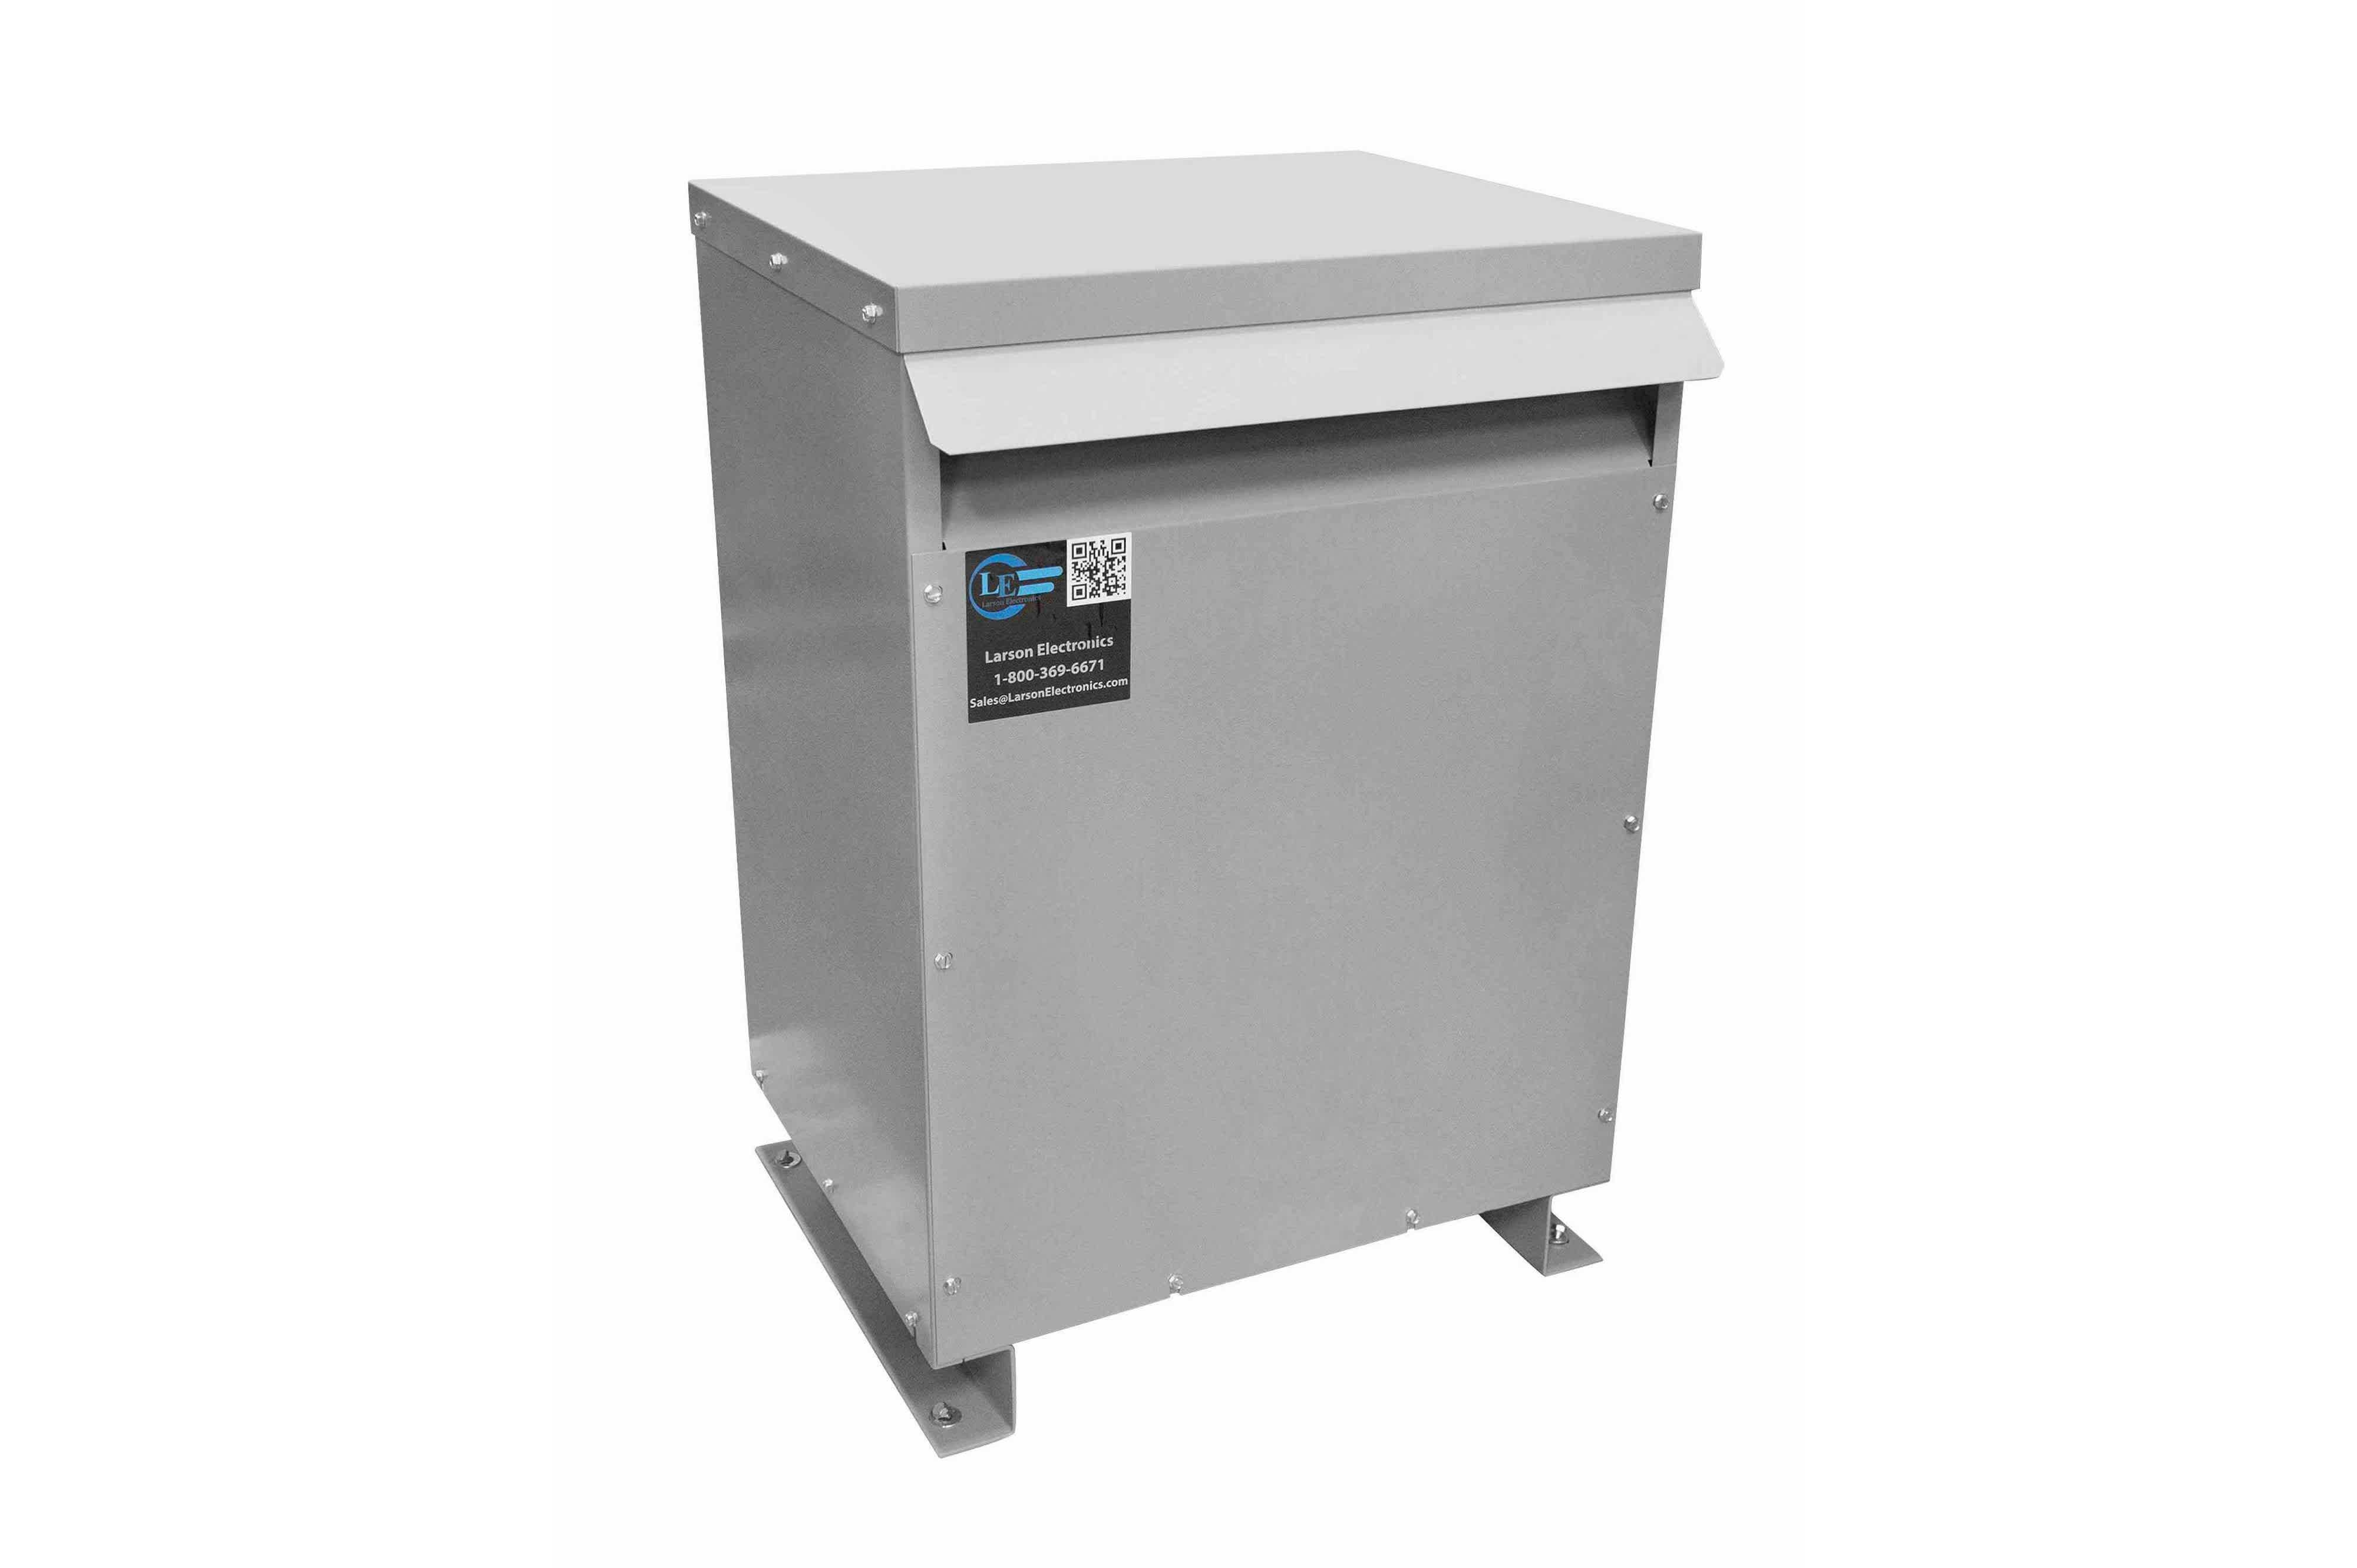 167 kVA 3PH Isolation Transformer, 380V Wye Primary, 240V Delta Secondary, N3R, Ventilated, 60 Hz